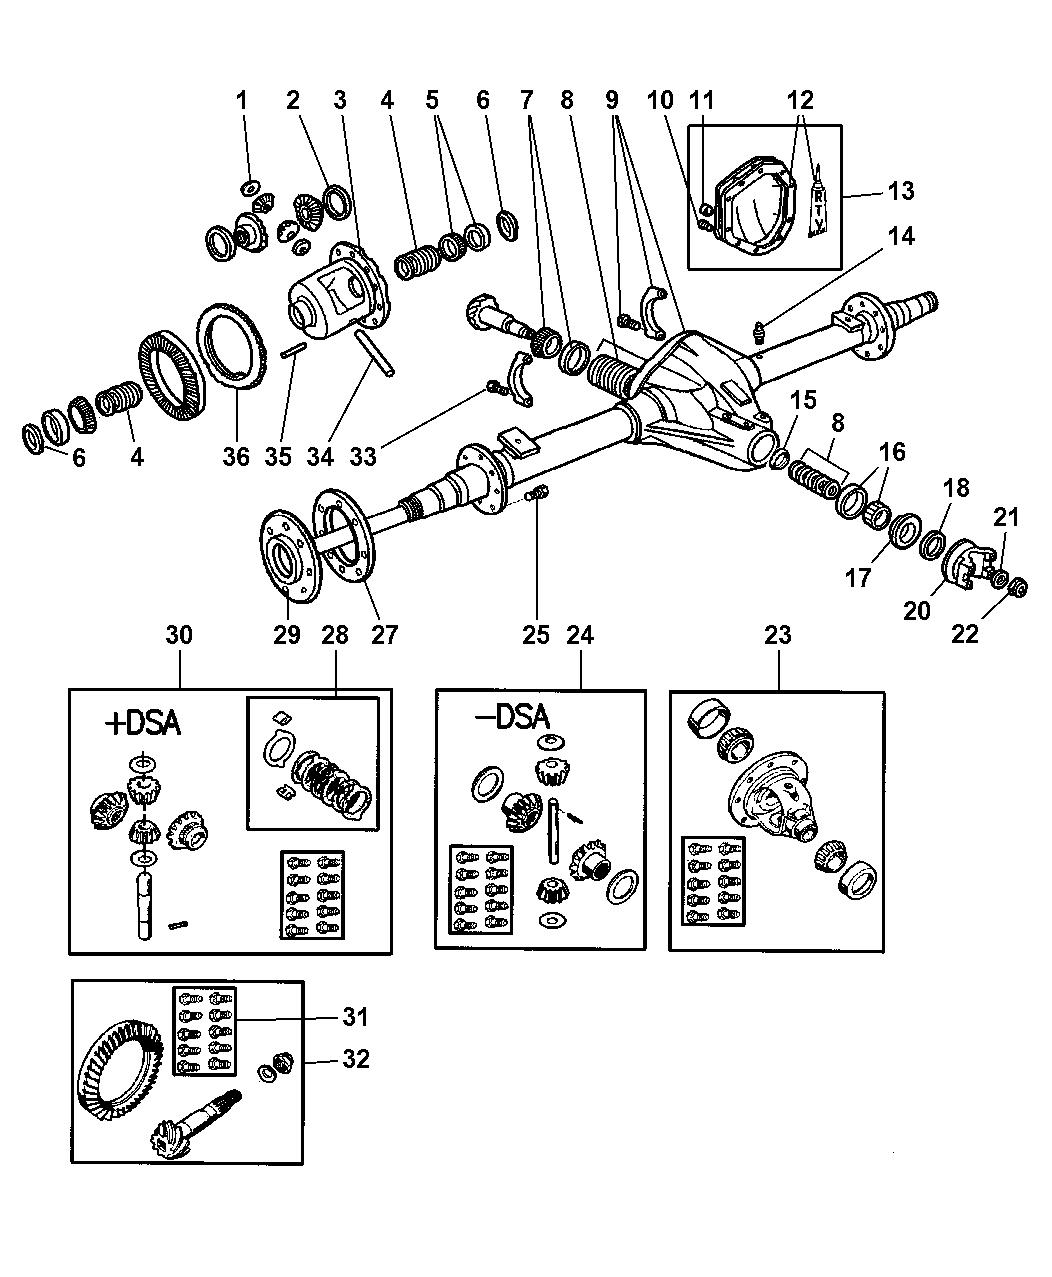 Dodge Ram 3500 Parts Diagram • Wiring Diagram For Free